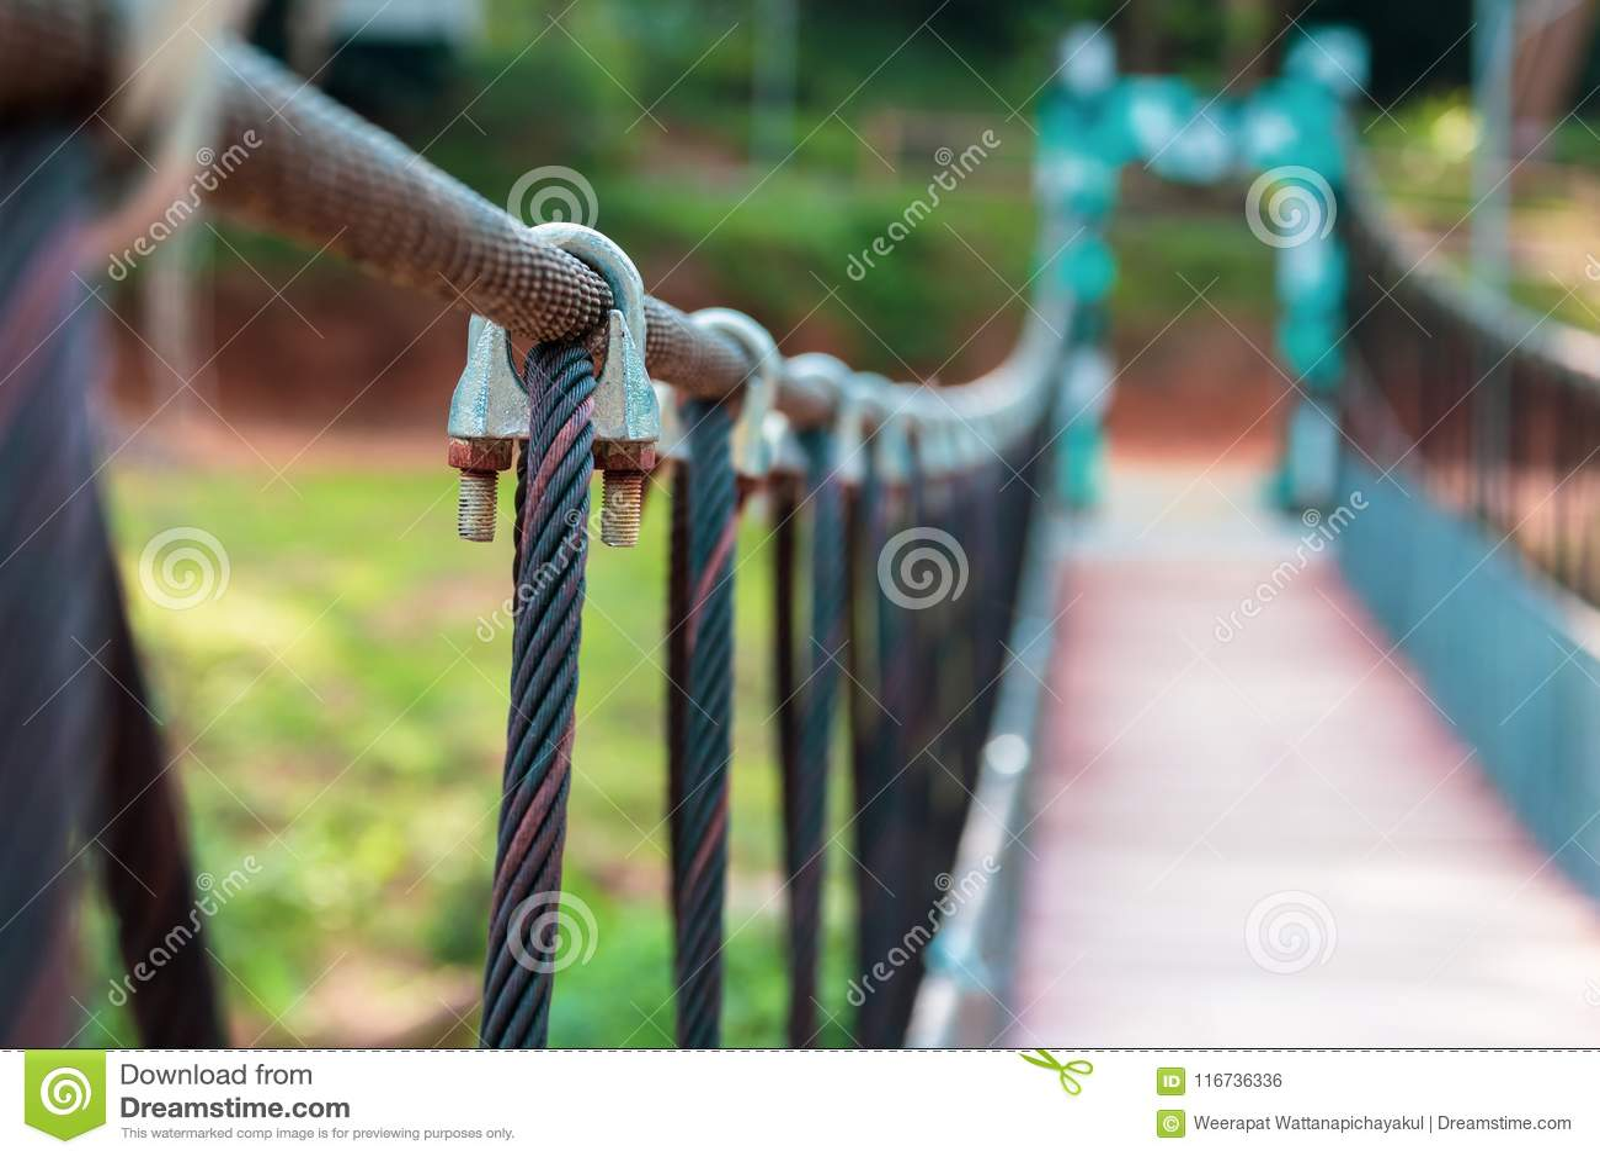 Sling Bridge Clip stock photo. Image of construction - 116736336